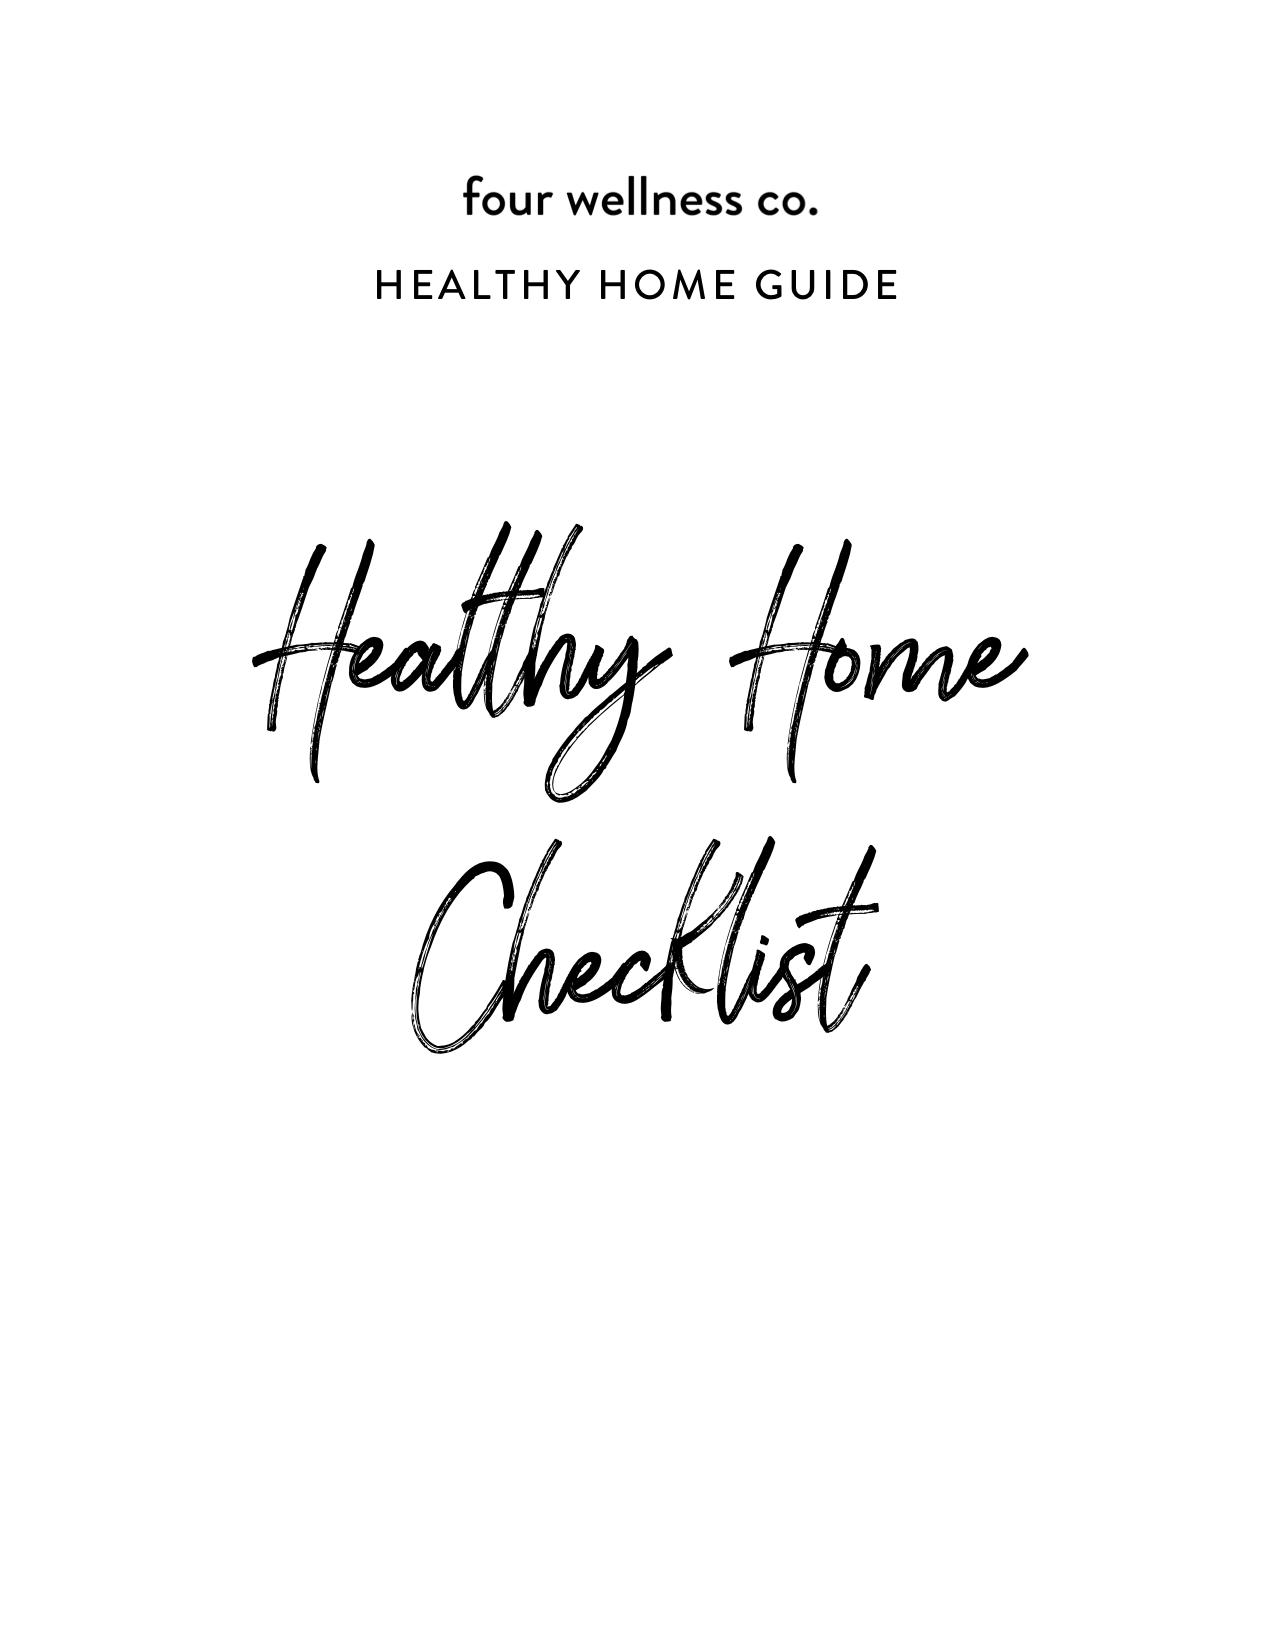 Healthy Home Checklist | Four Wellness Co.